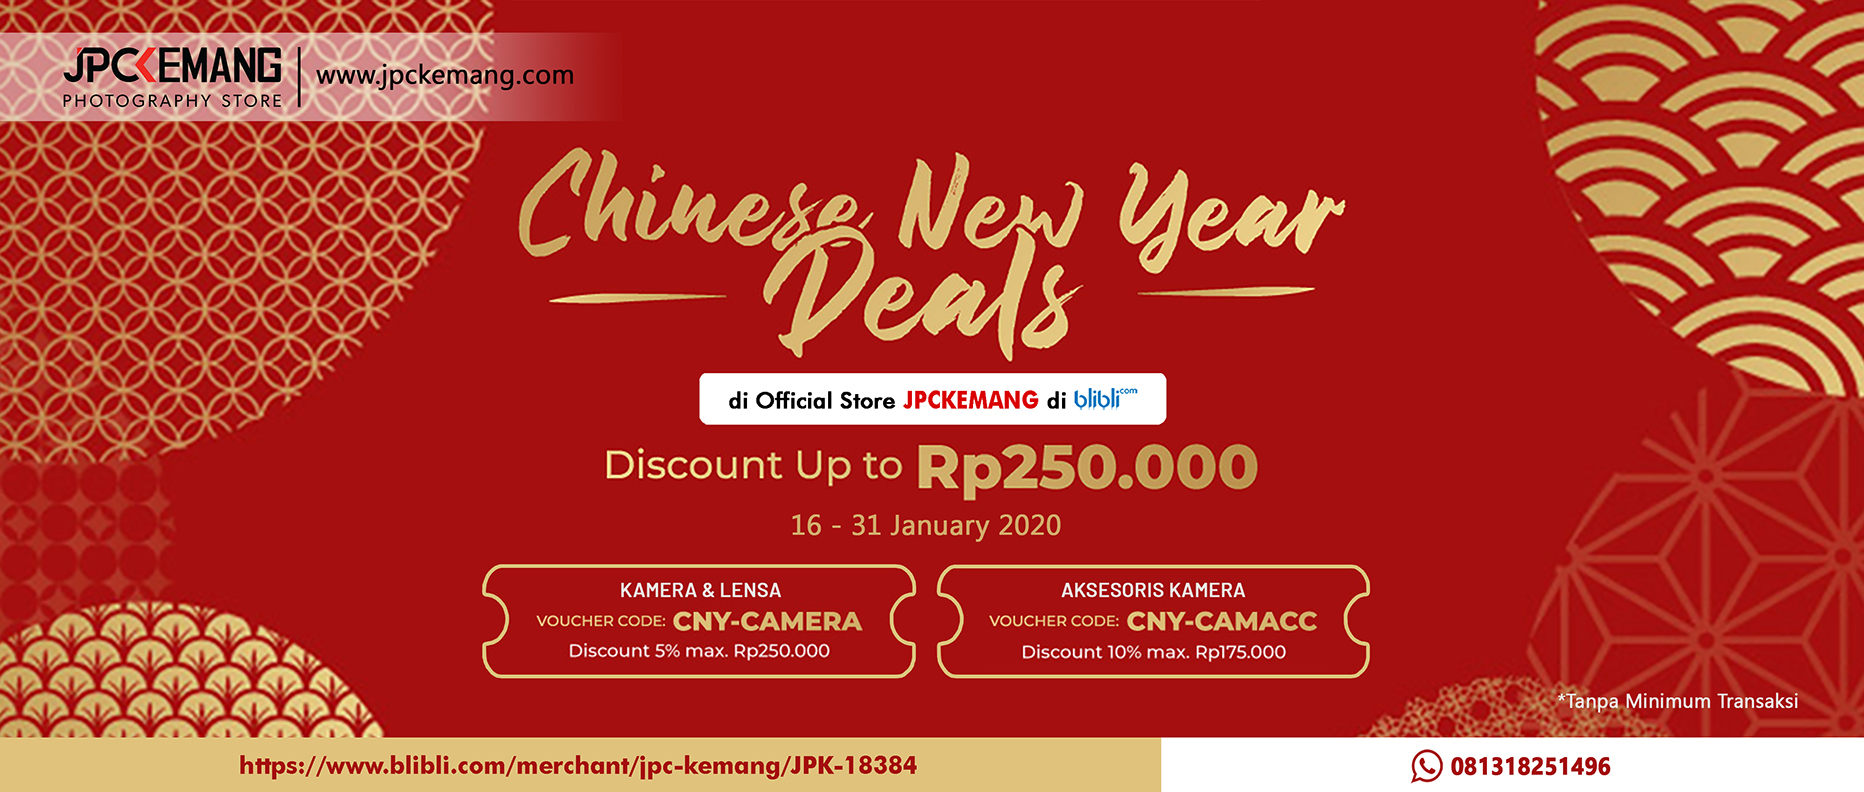 Promo Blibli Chinese New Year